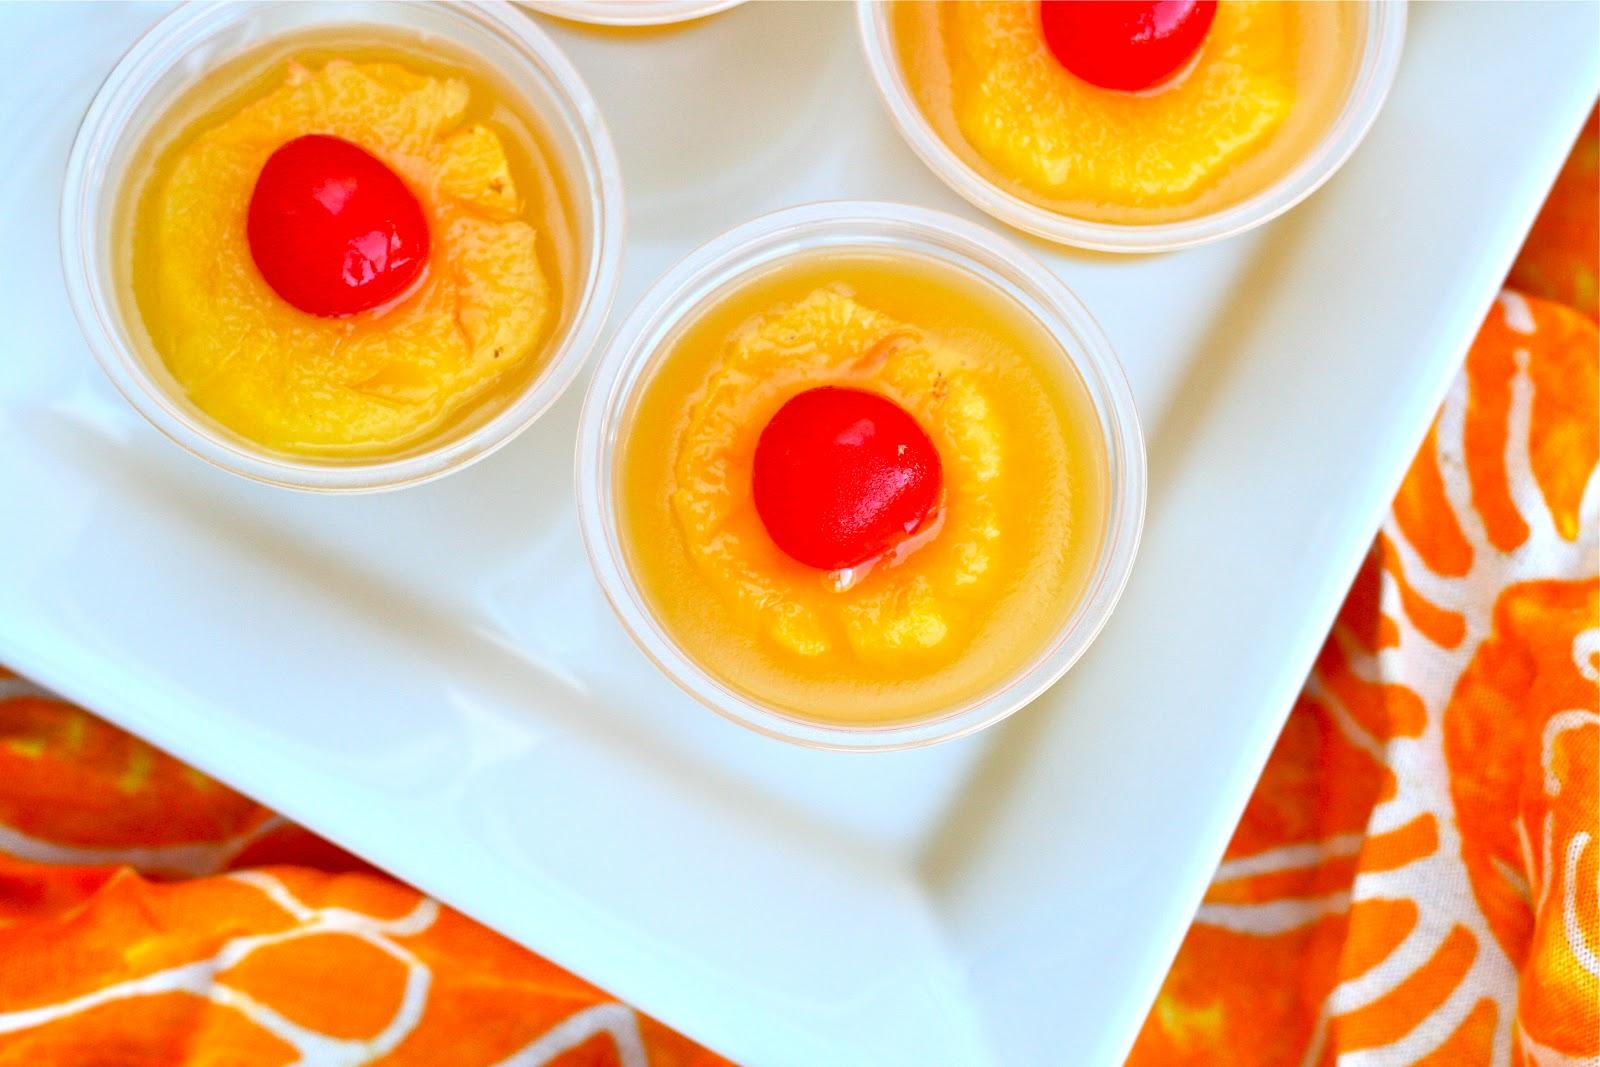 Easy Pineapple Upside Down Cake Jello Shots